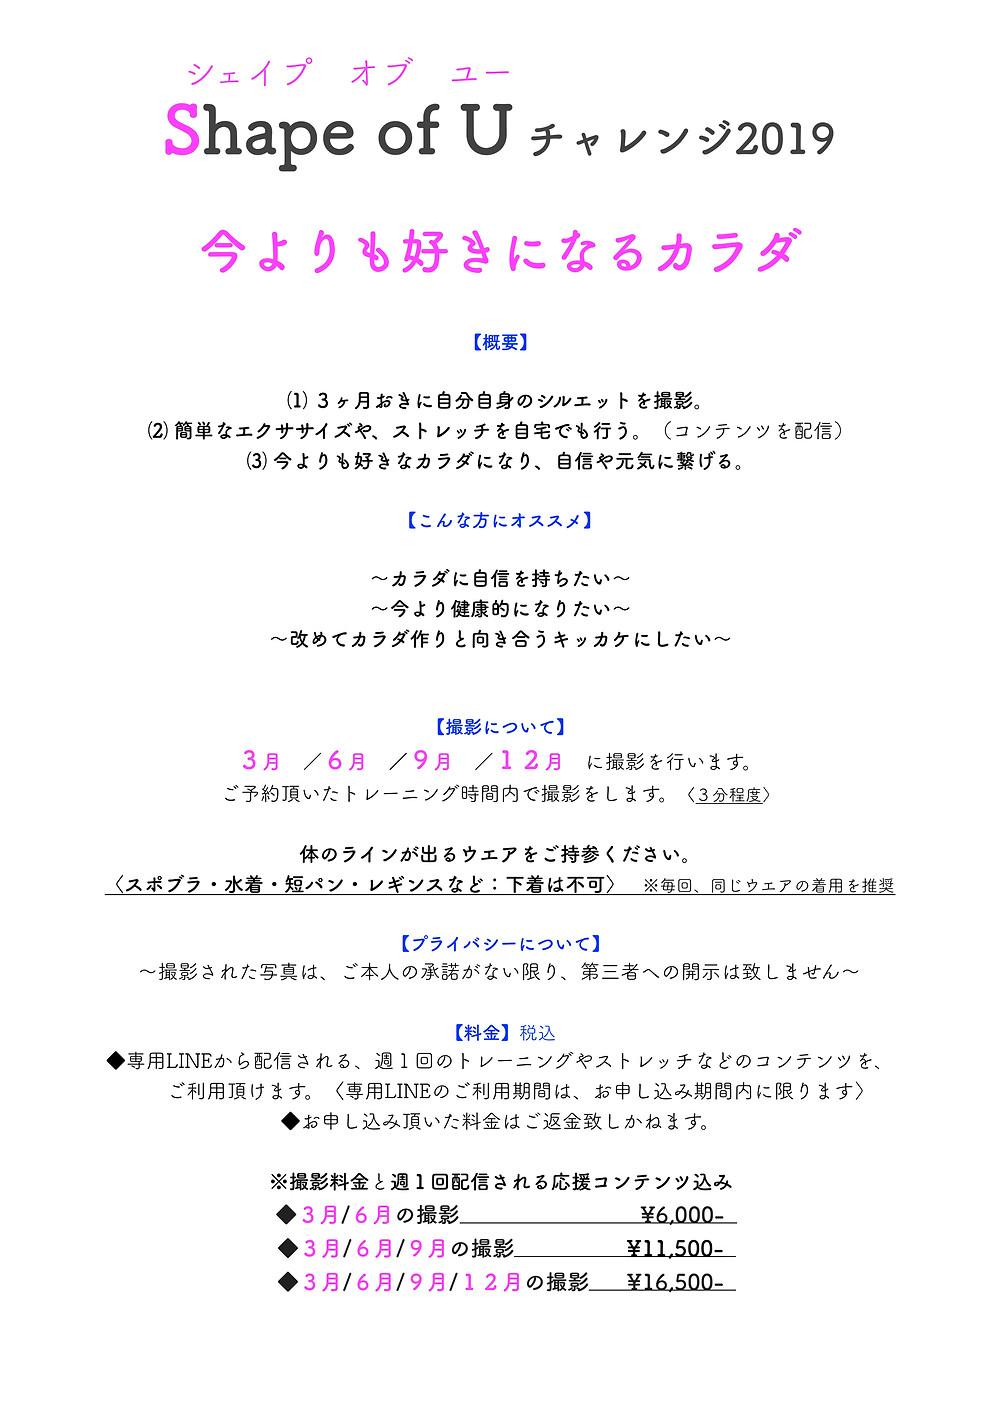 YAMADA BODY MAKE.イベント Shape of U シェイプ オブユー